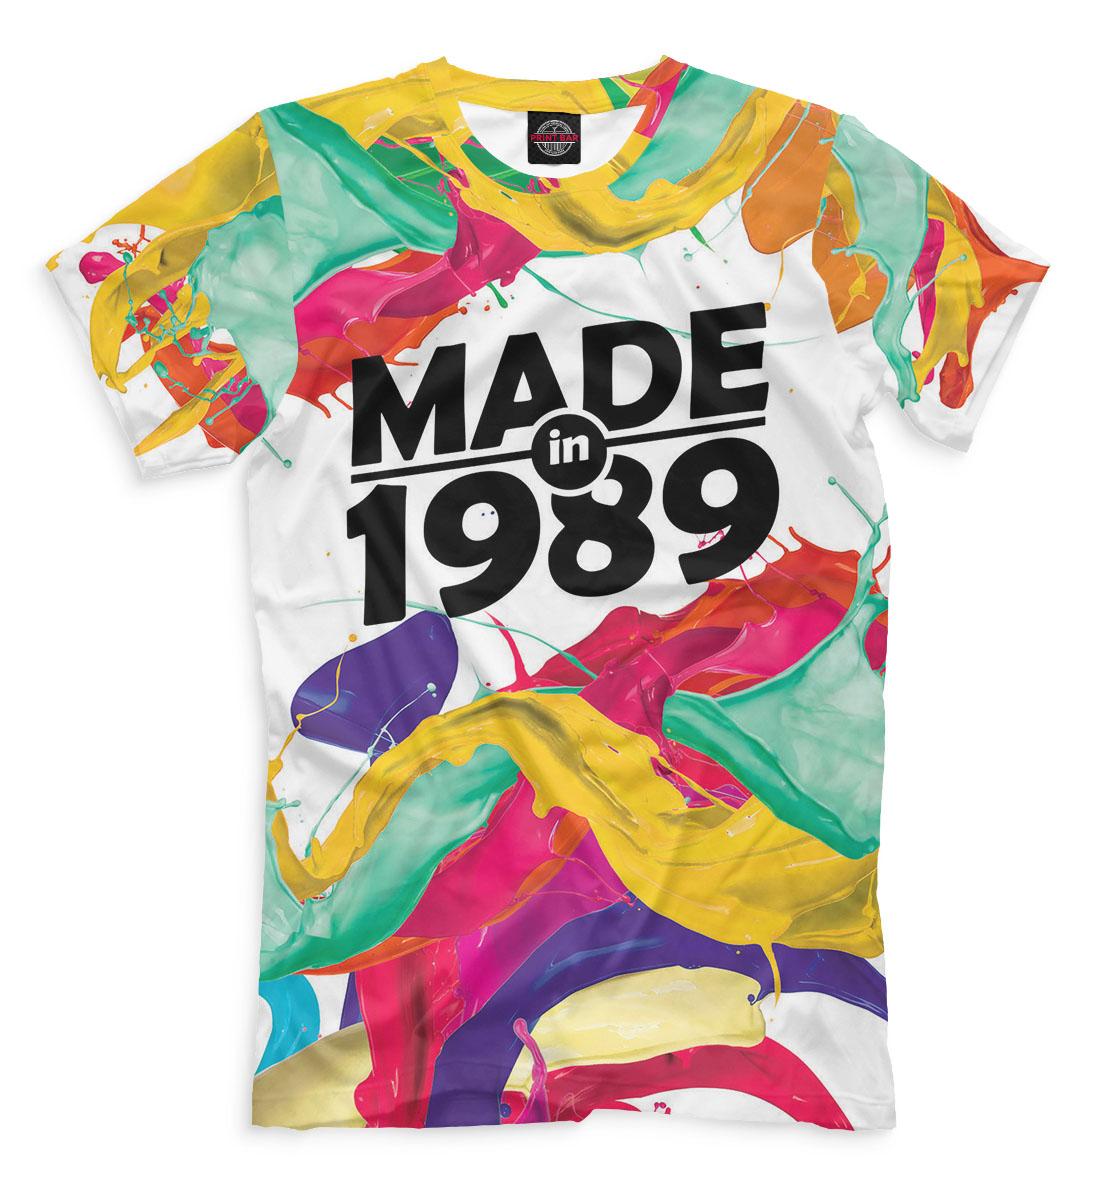 Купить Made in 1989, Printbar, Футболки, DVA-248315-fut-2